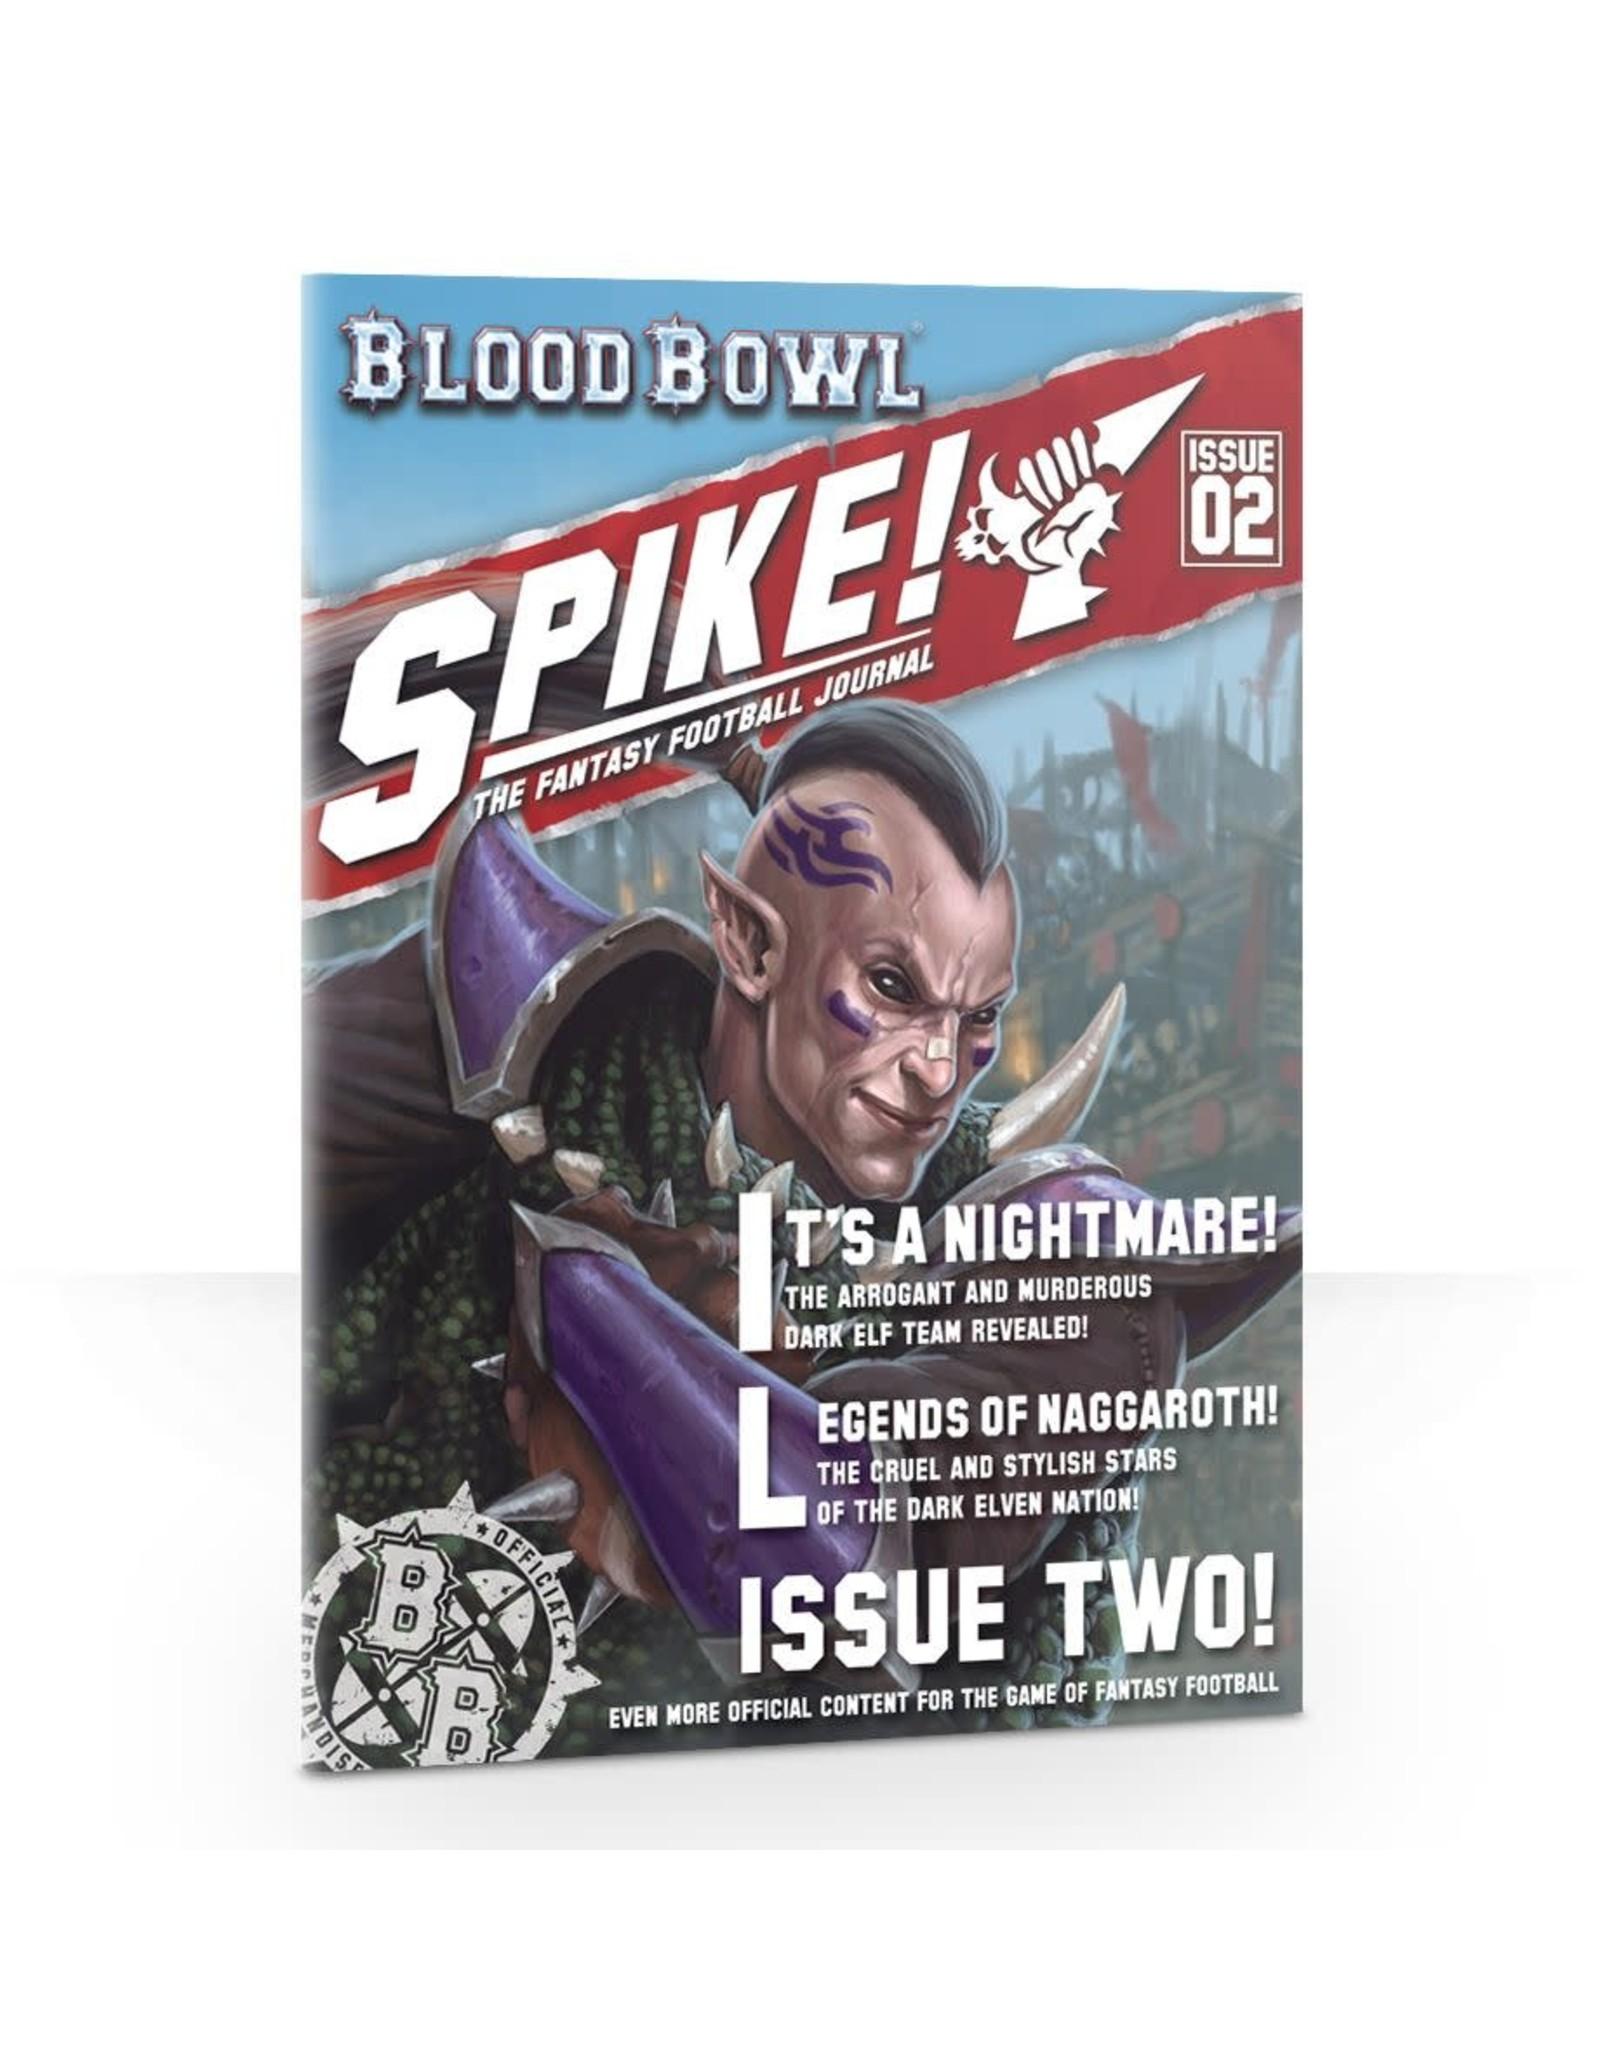 Blood Bowl Blood Bowl - Spike Magazine 2 (ENG)